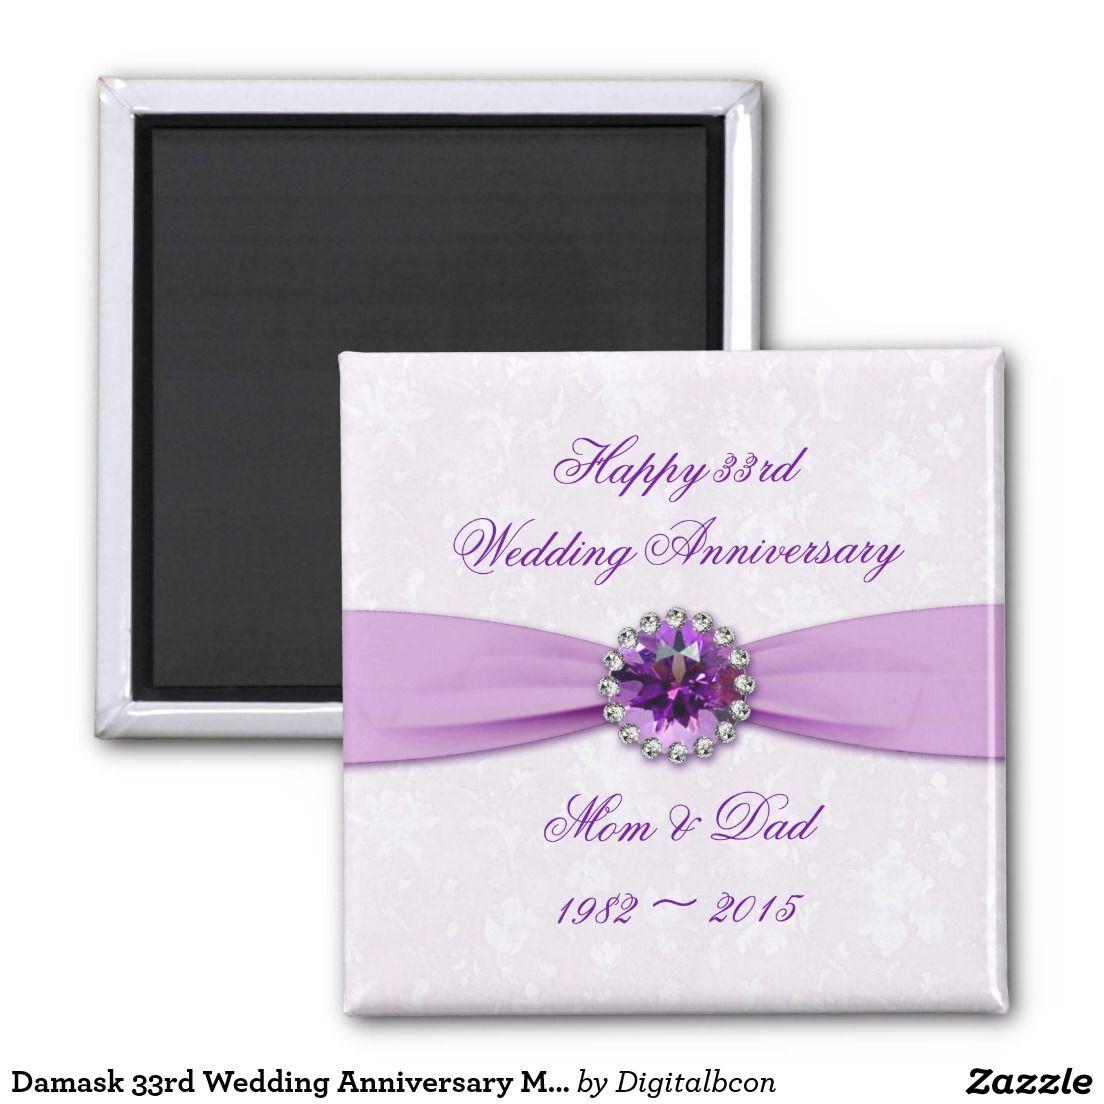 33rd Wedding Anniversary Gift: Damask 33rd Wedding Anniversary Magnet